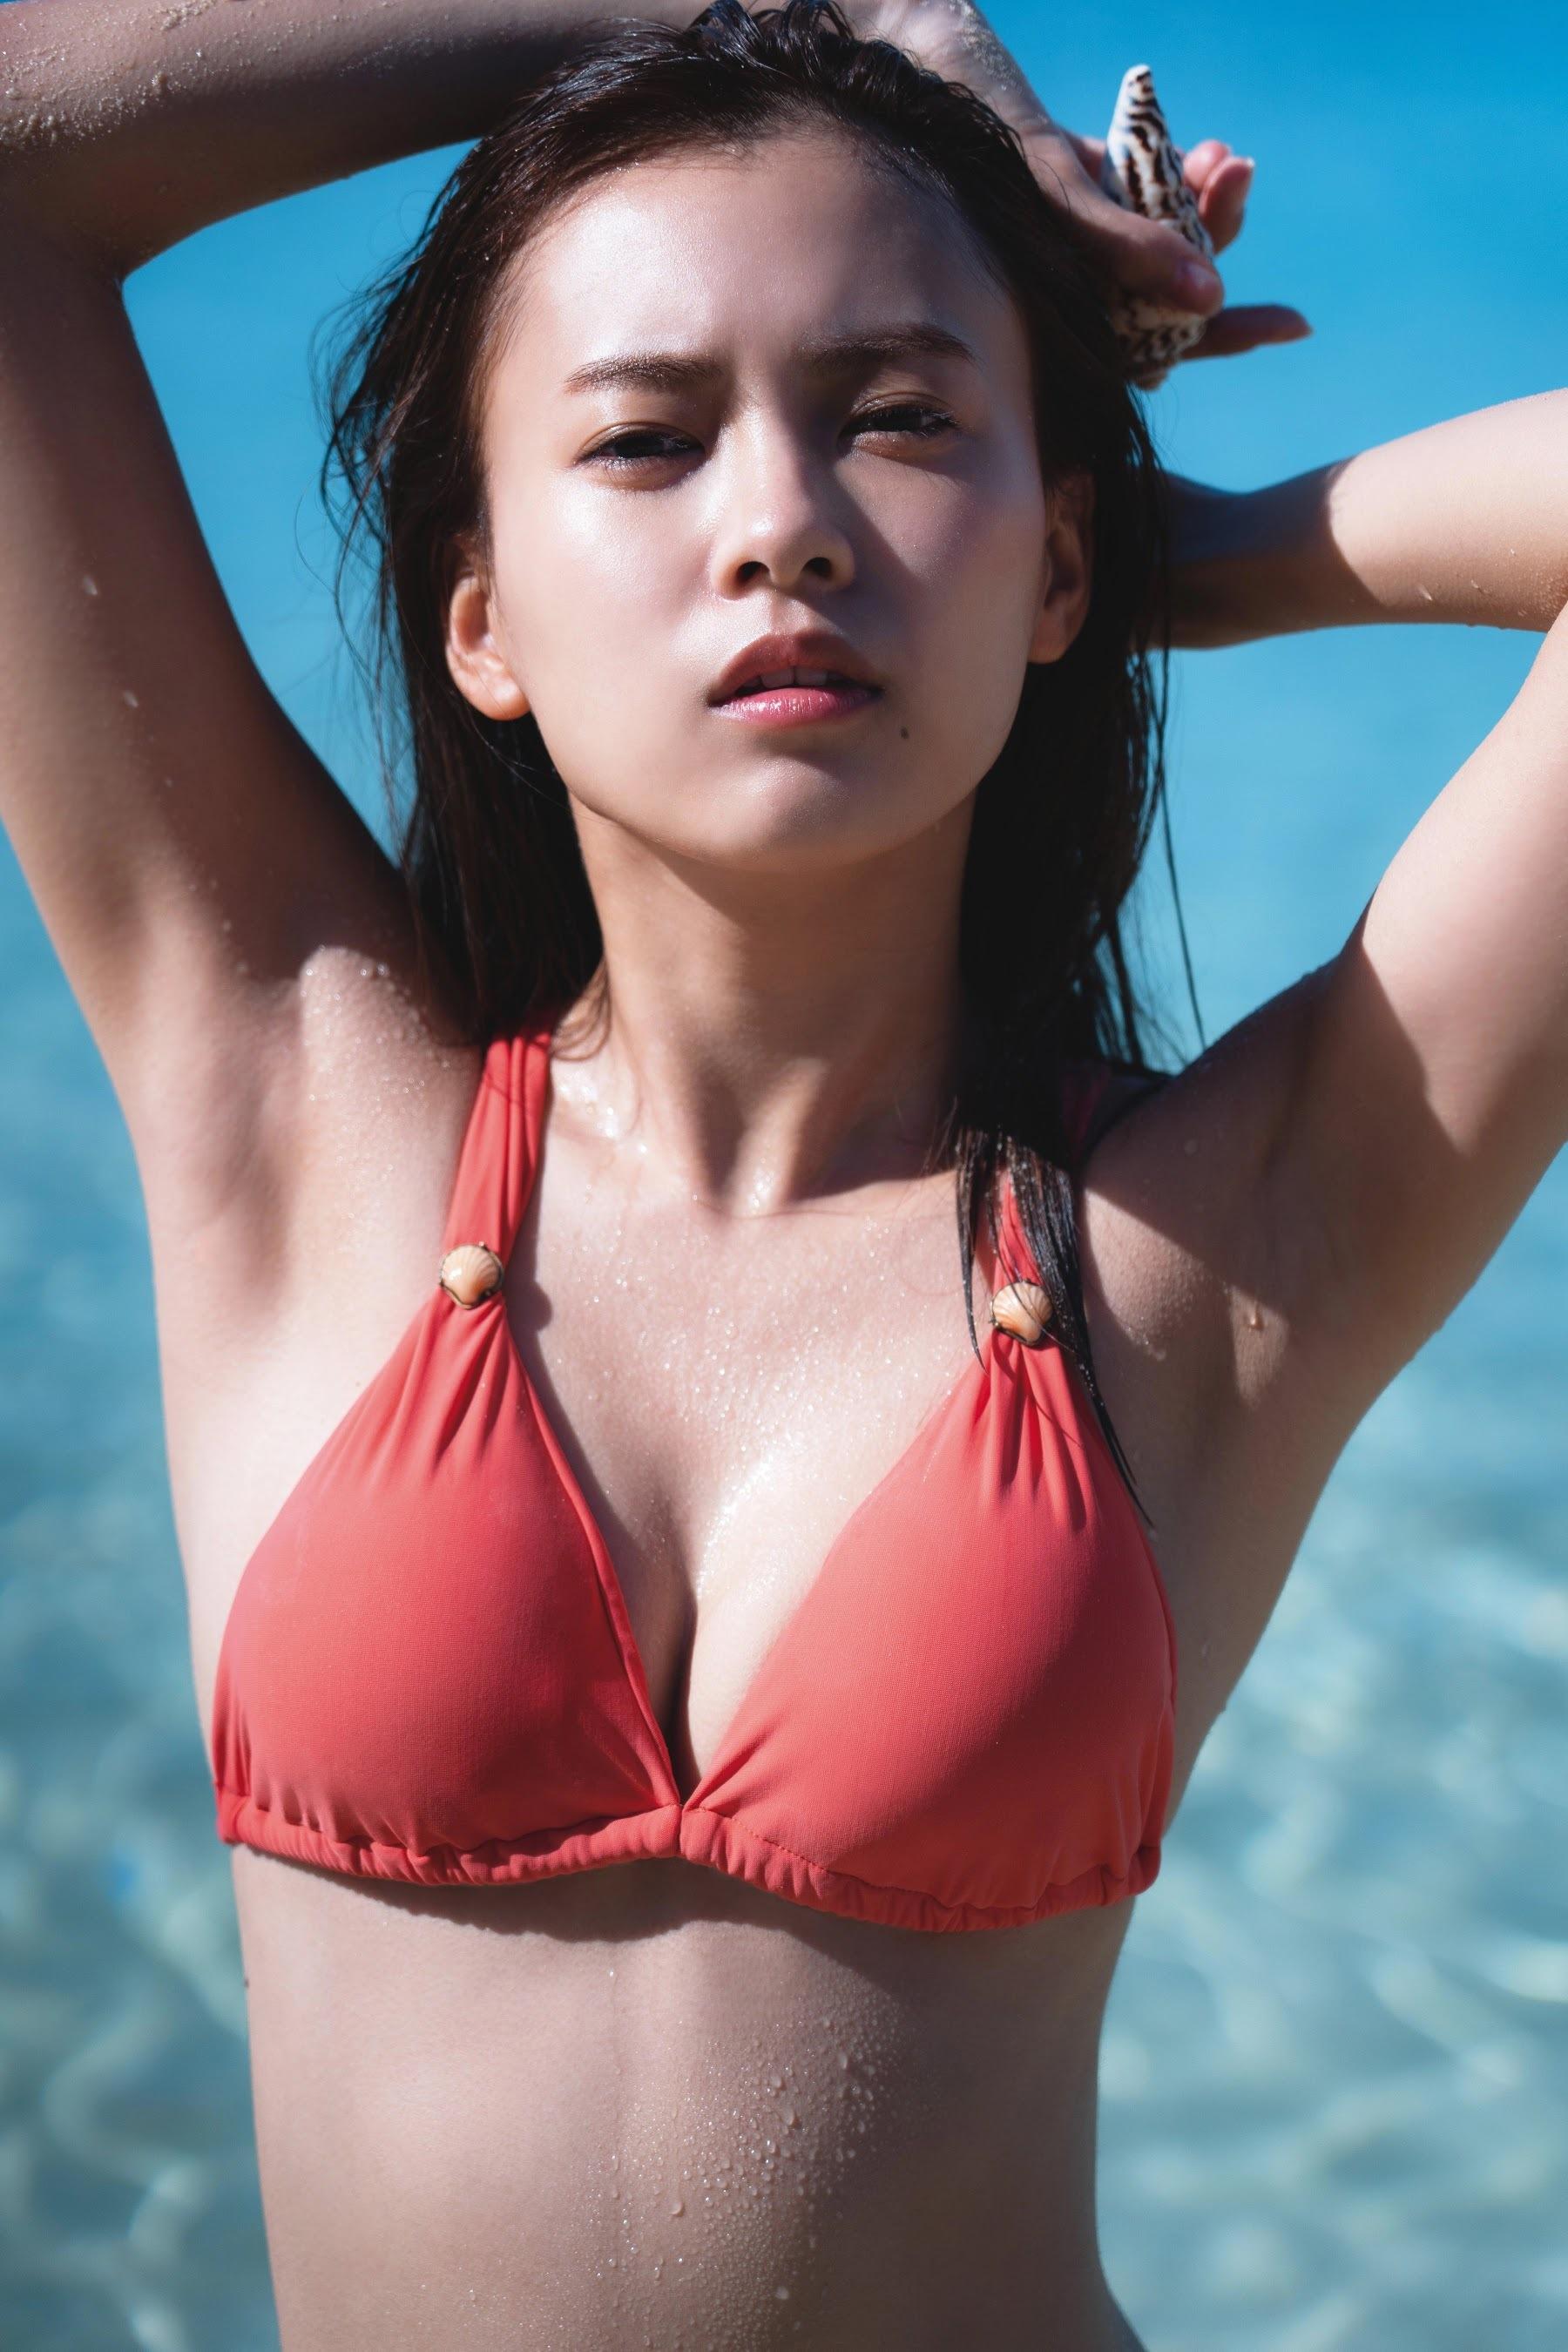 今田美樱-WEEKLY PLAYBOY 2021年第二十四期  高清套图 第53张